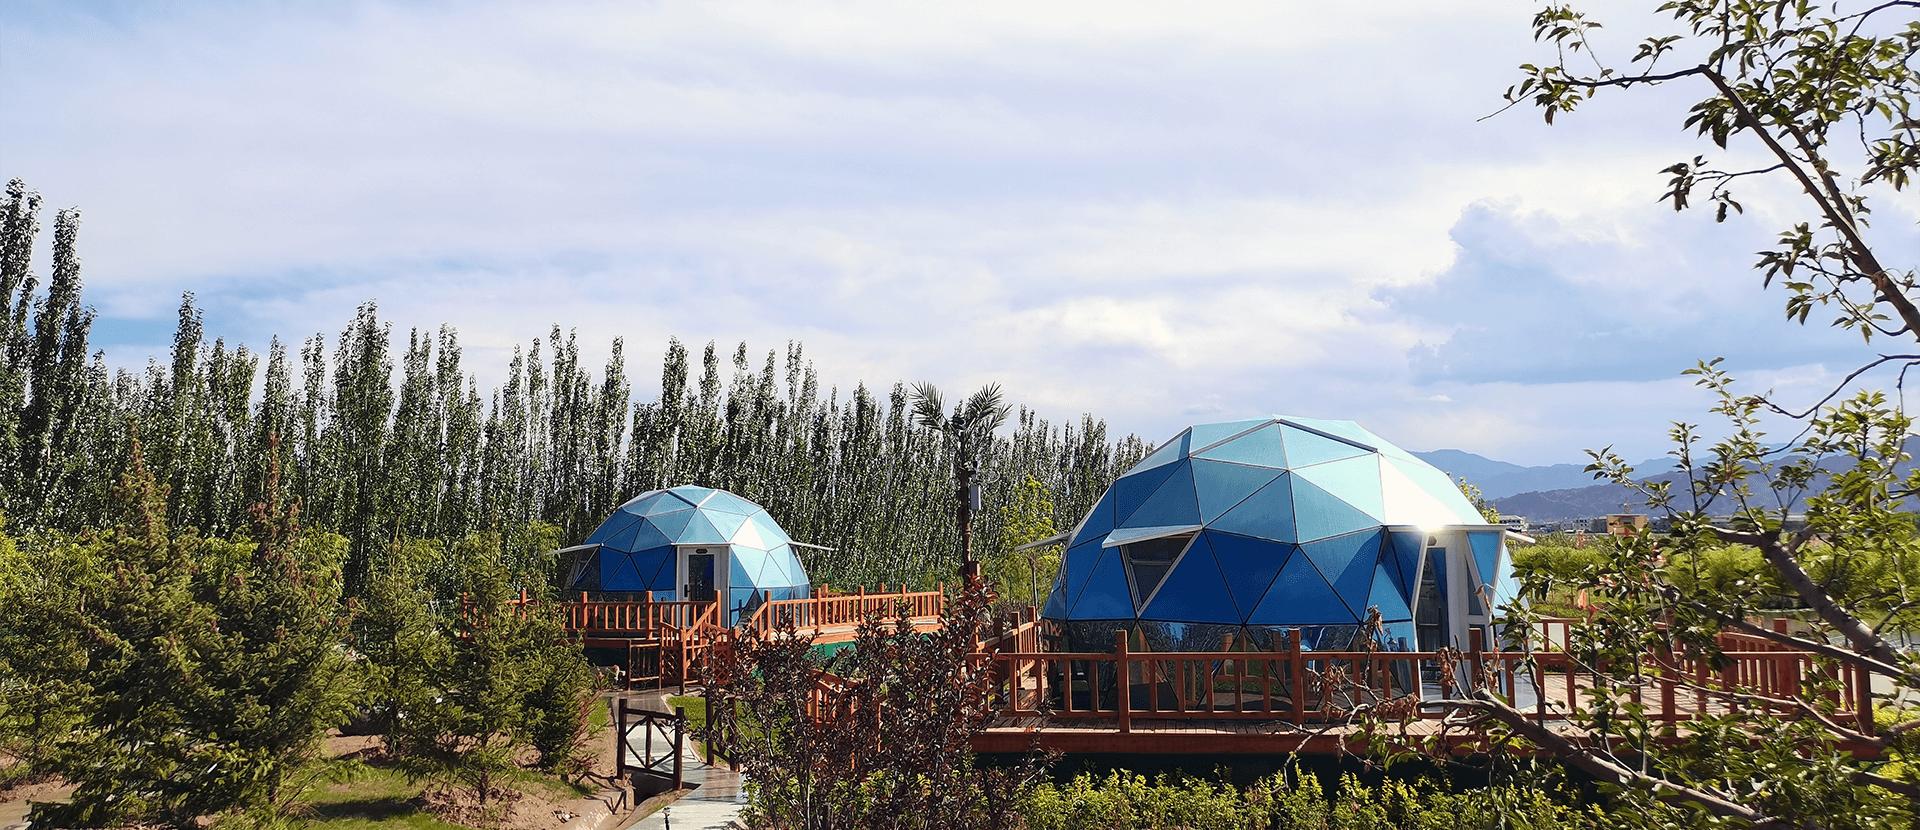 glass dome igloo